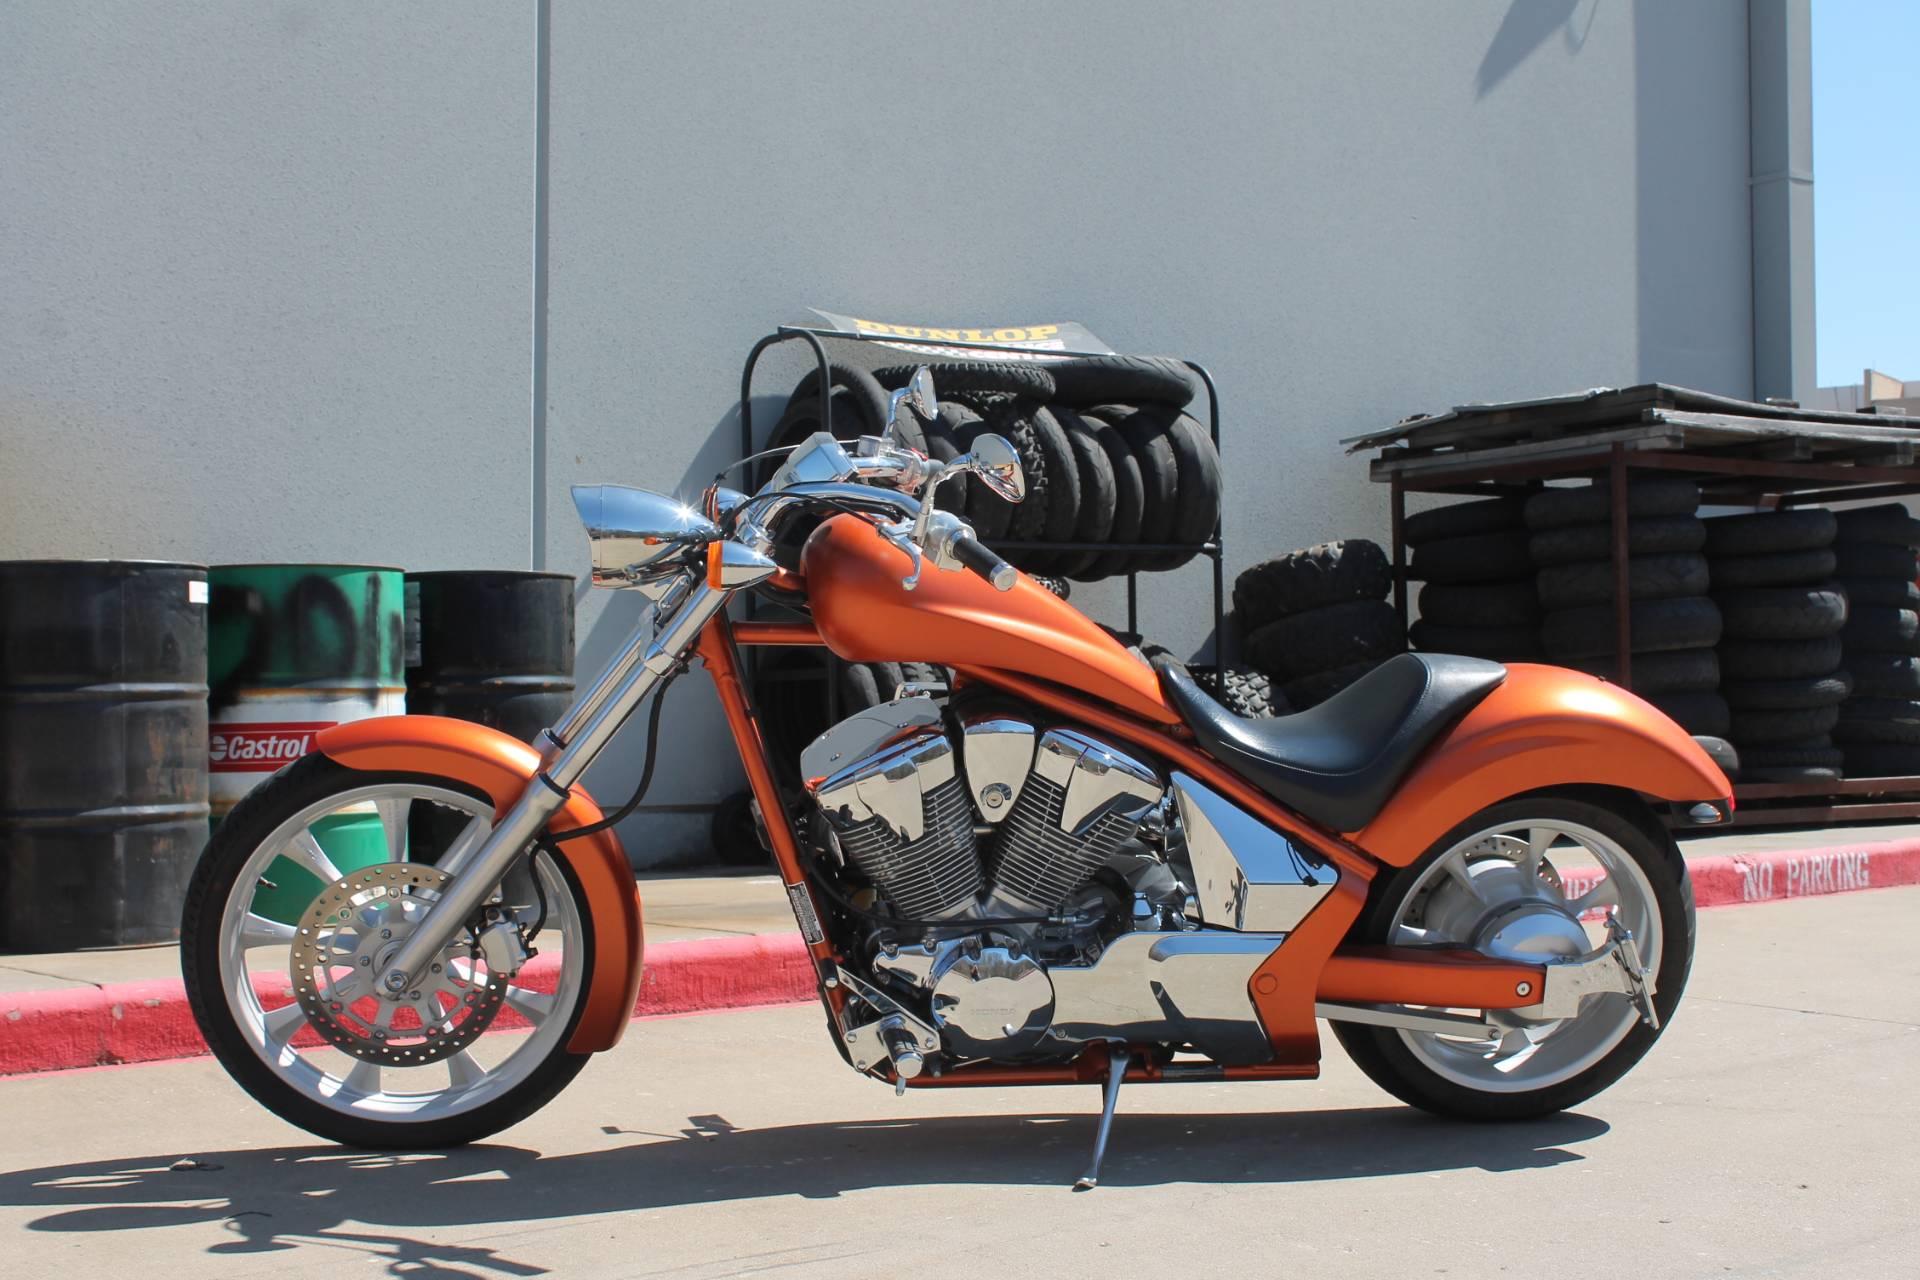 2011 Honda Fury for sale 134900